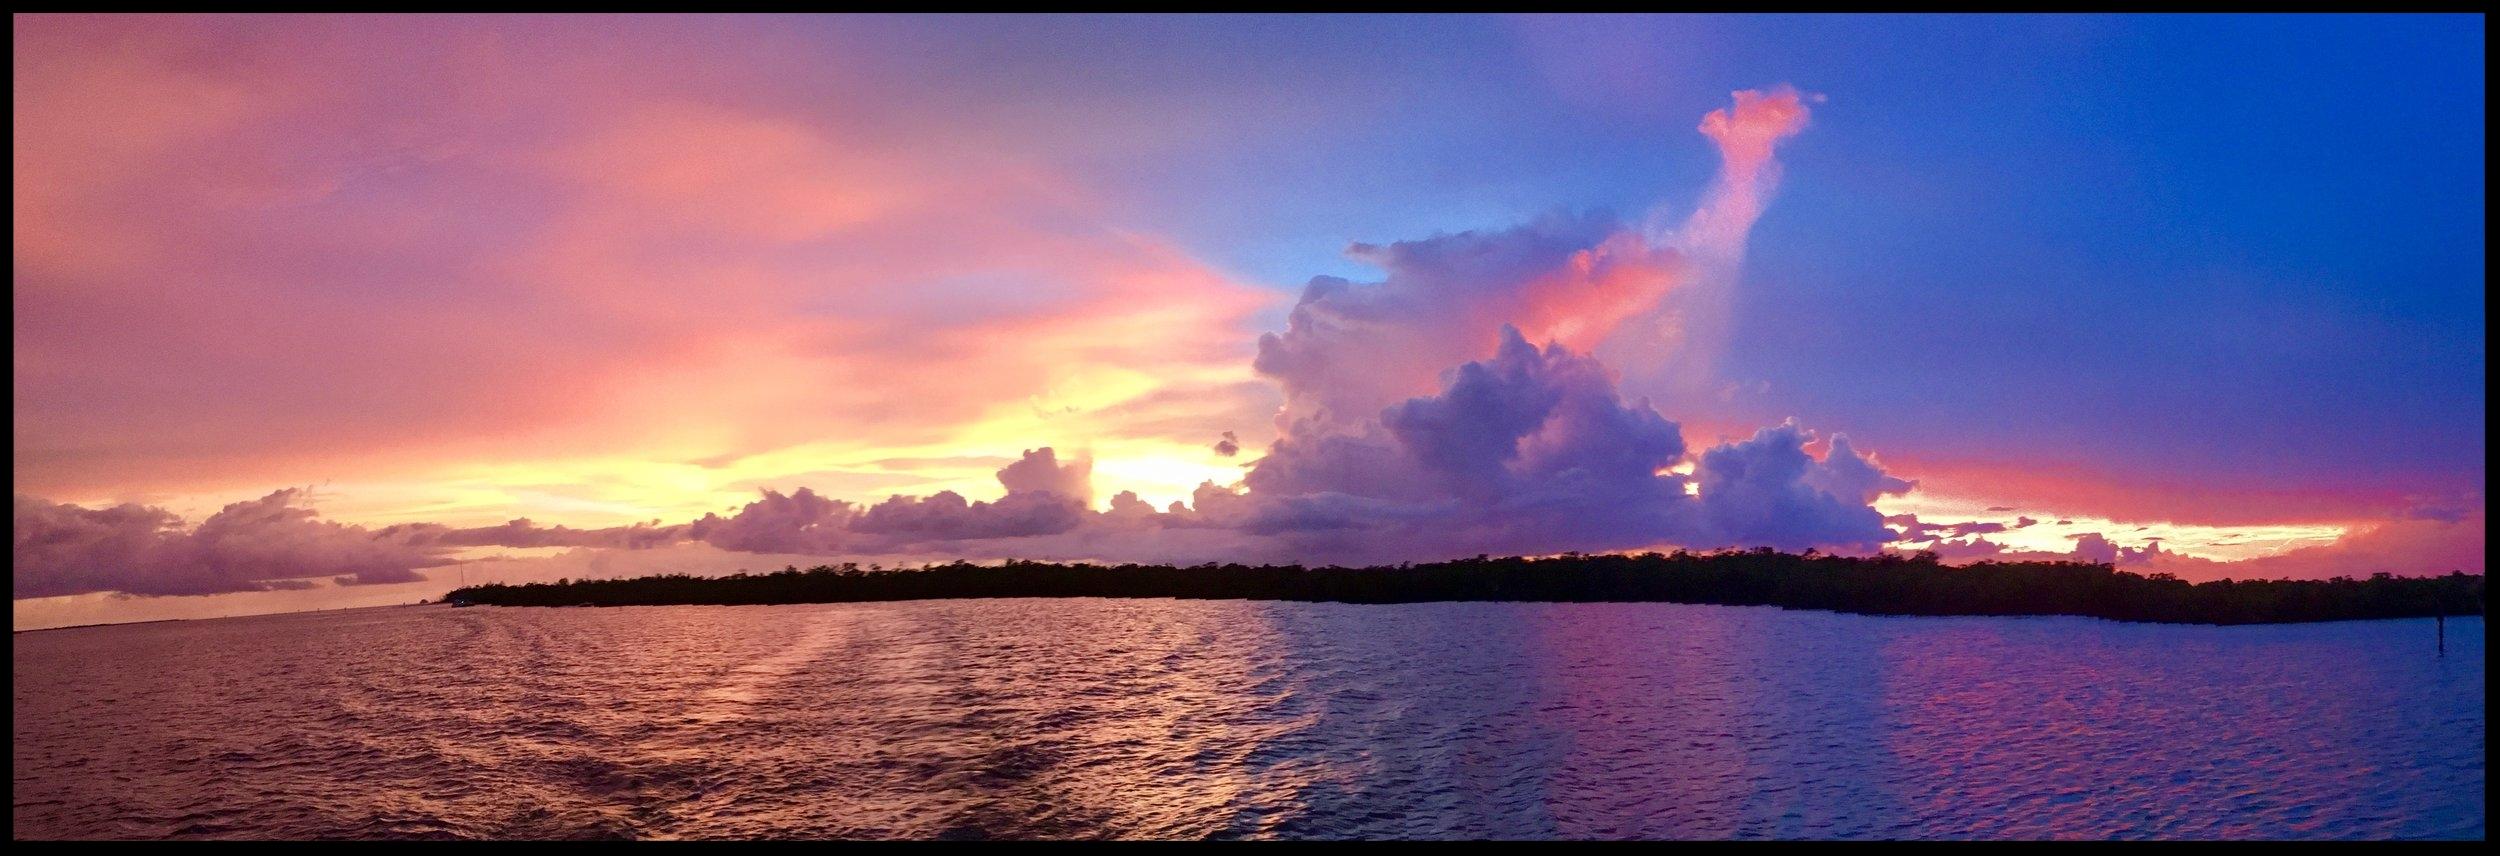 Sunset-Moonrise over The Ten Thousand Islands National Wildlife Refuge